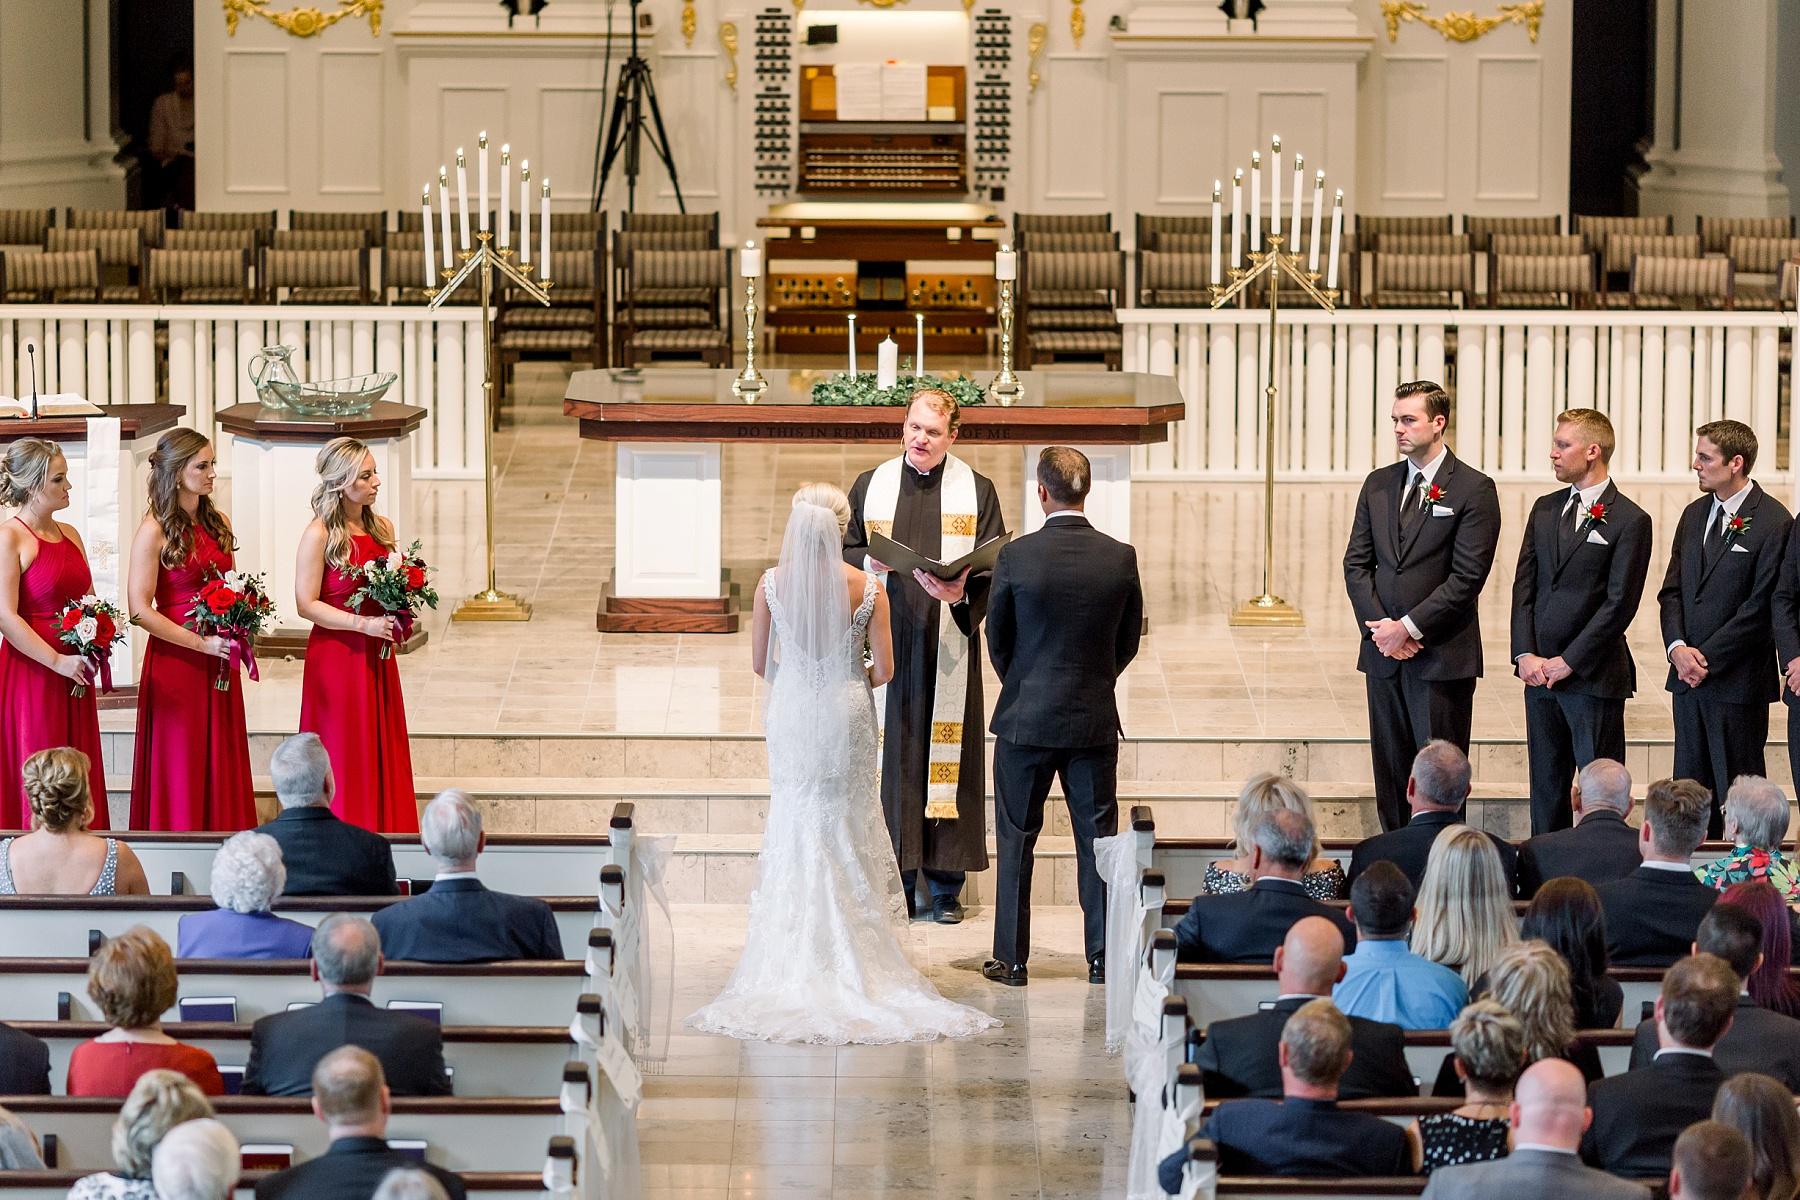 midwest-adventurous-wedding-photographer-elizabeth-ladean-photography-photo_4766.jpg